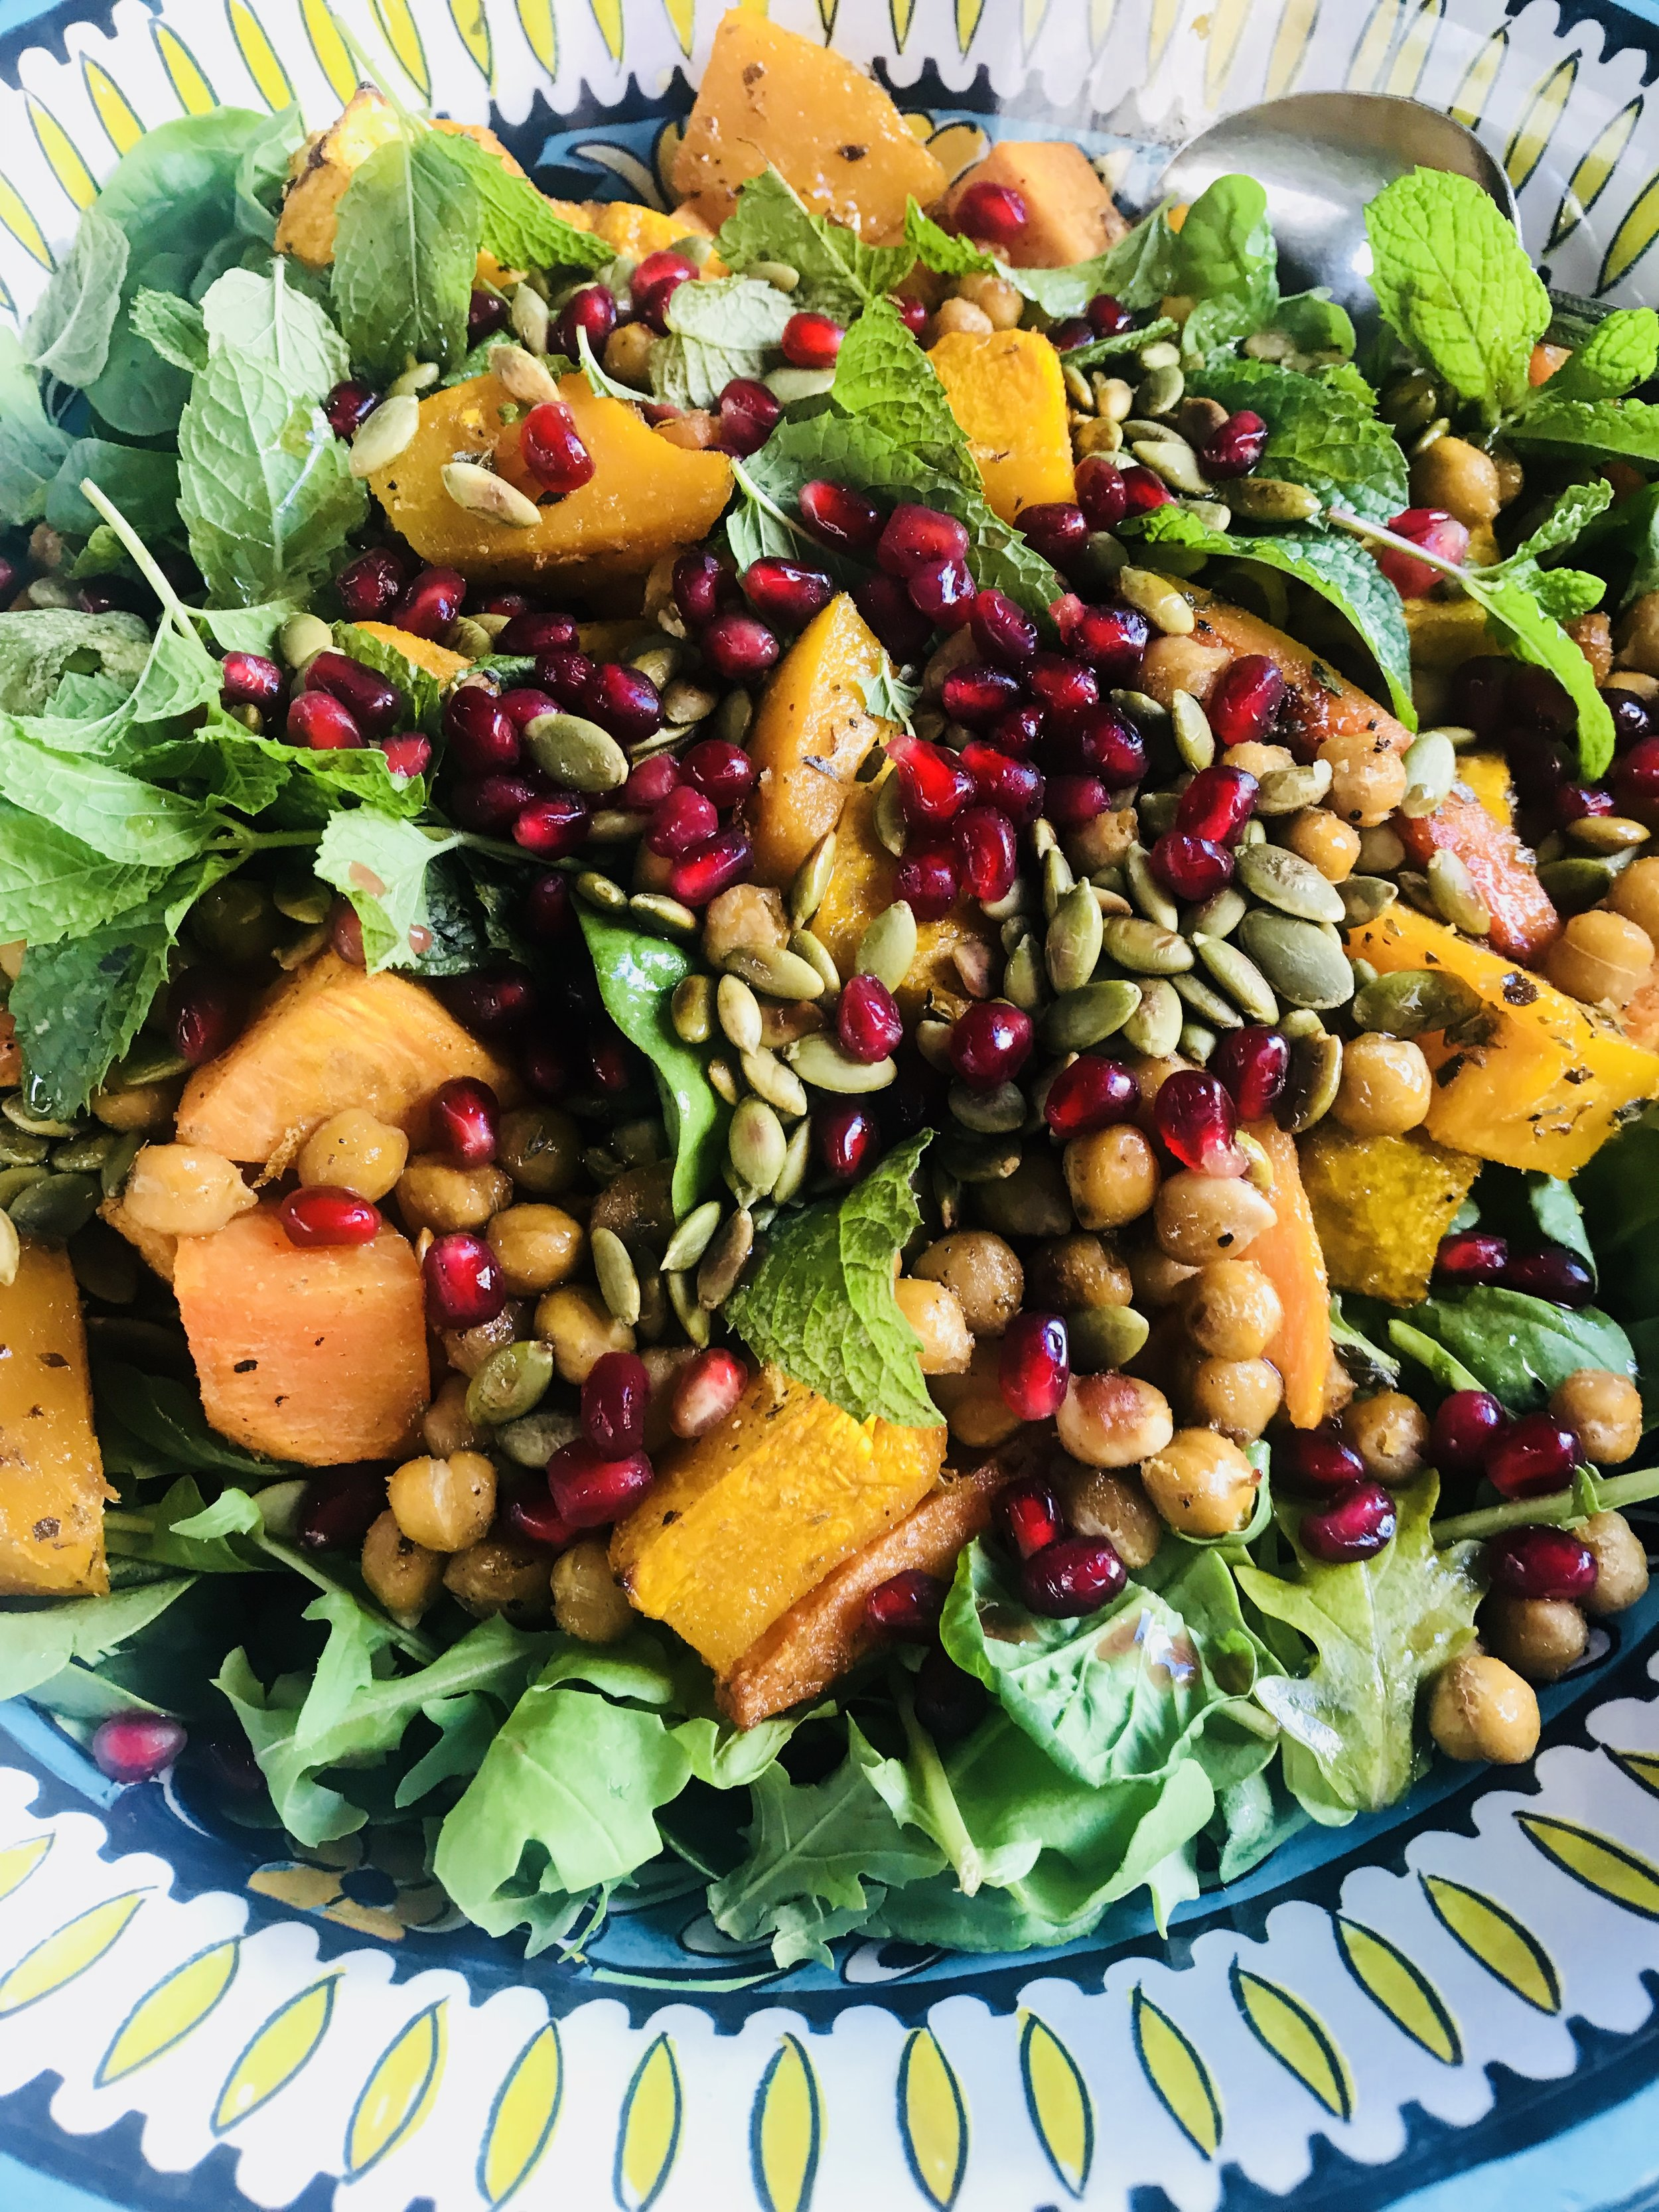 Roasted pumpkin salad with crispy chickpeas, pomegranate and